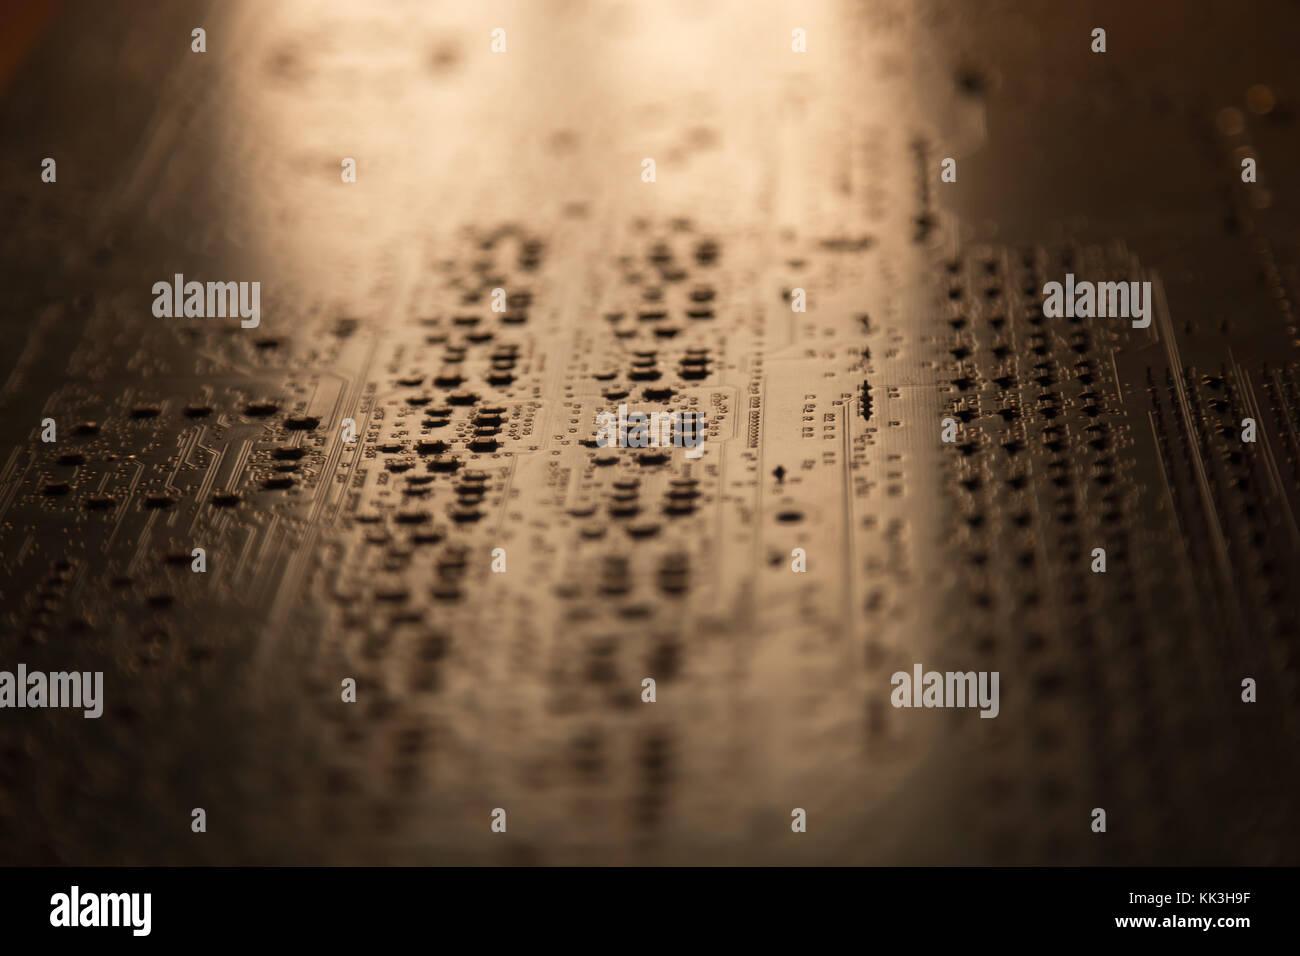 Printed Circuit Board Blue Stock Photos Kk Wiring Diagram Close Up Of Electronic Image